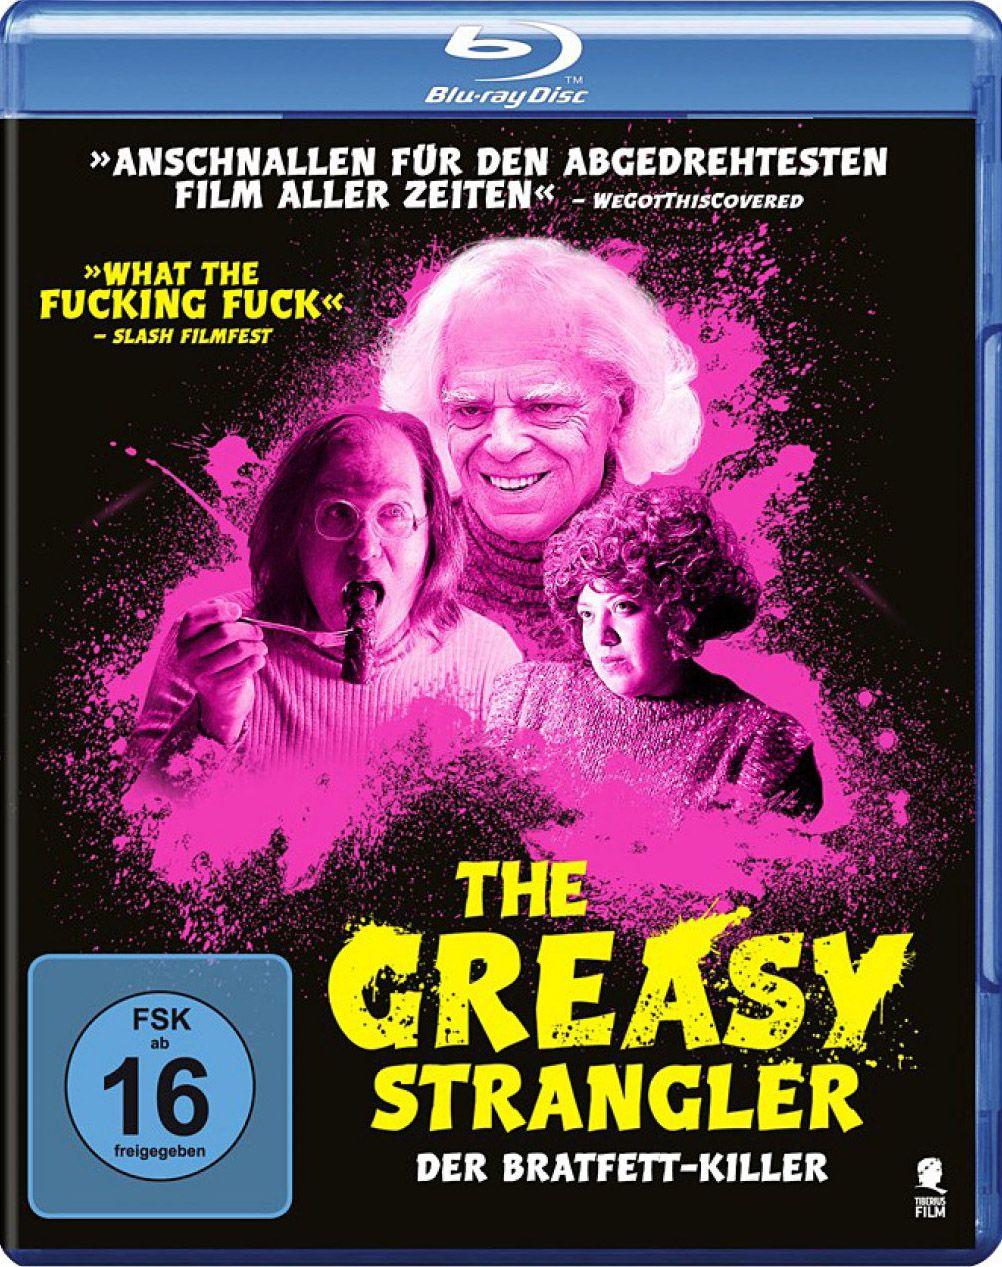 Greasy Strangler, The - Der Bratfett-Killer (BLURAY)